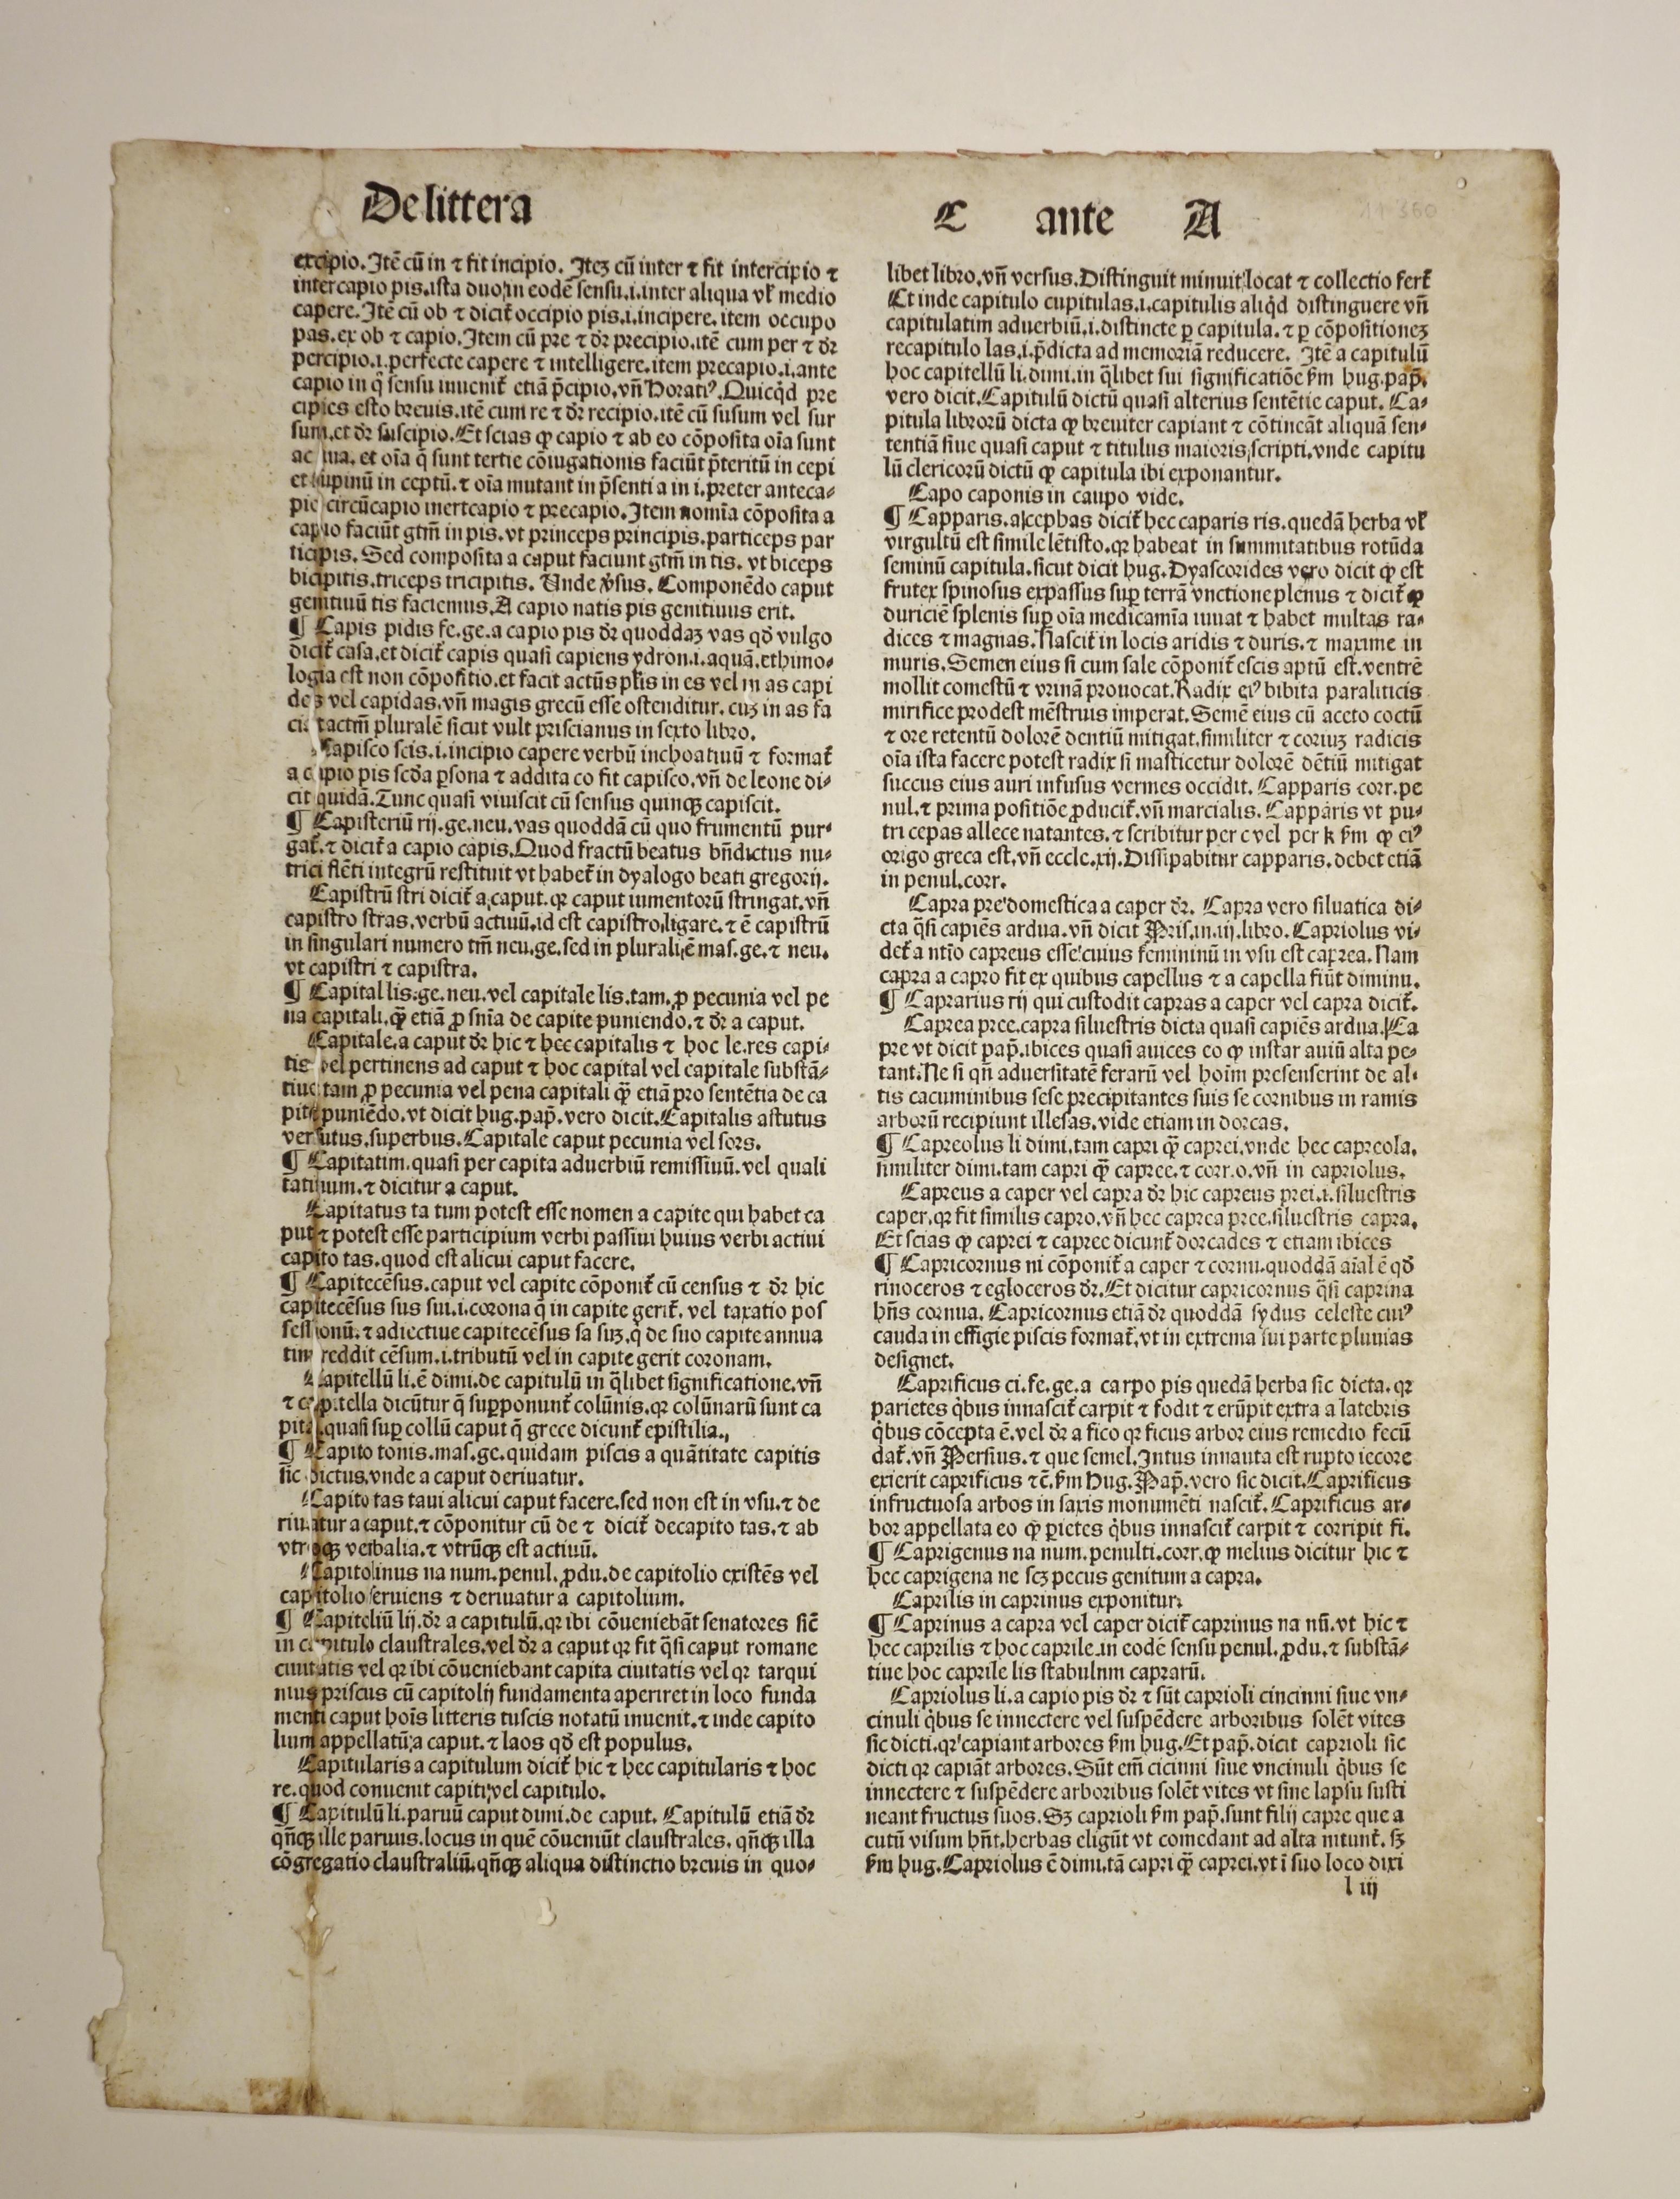 Catholicon (GW 03191). De littera C ante: Johannes Balbus: